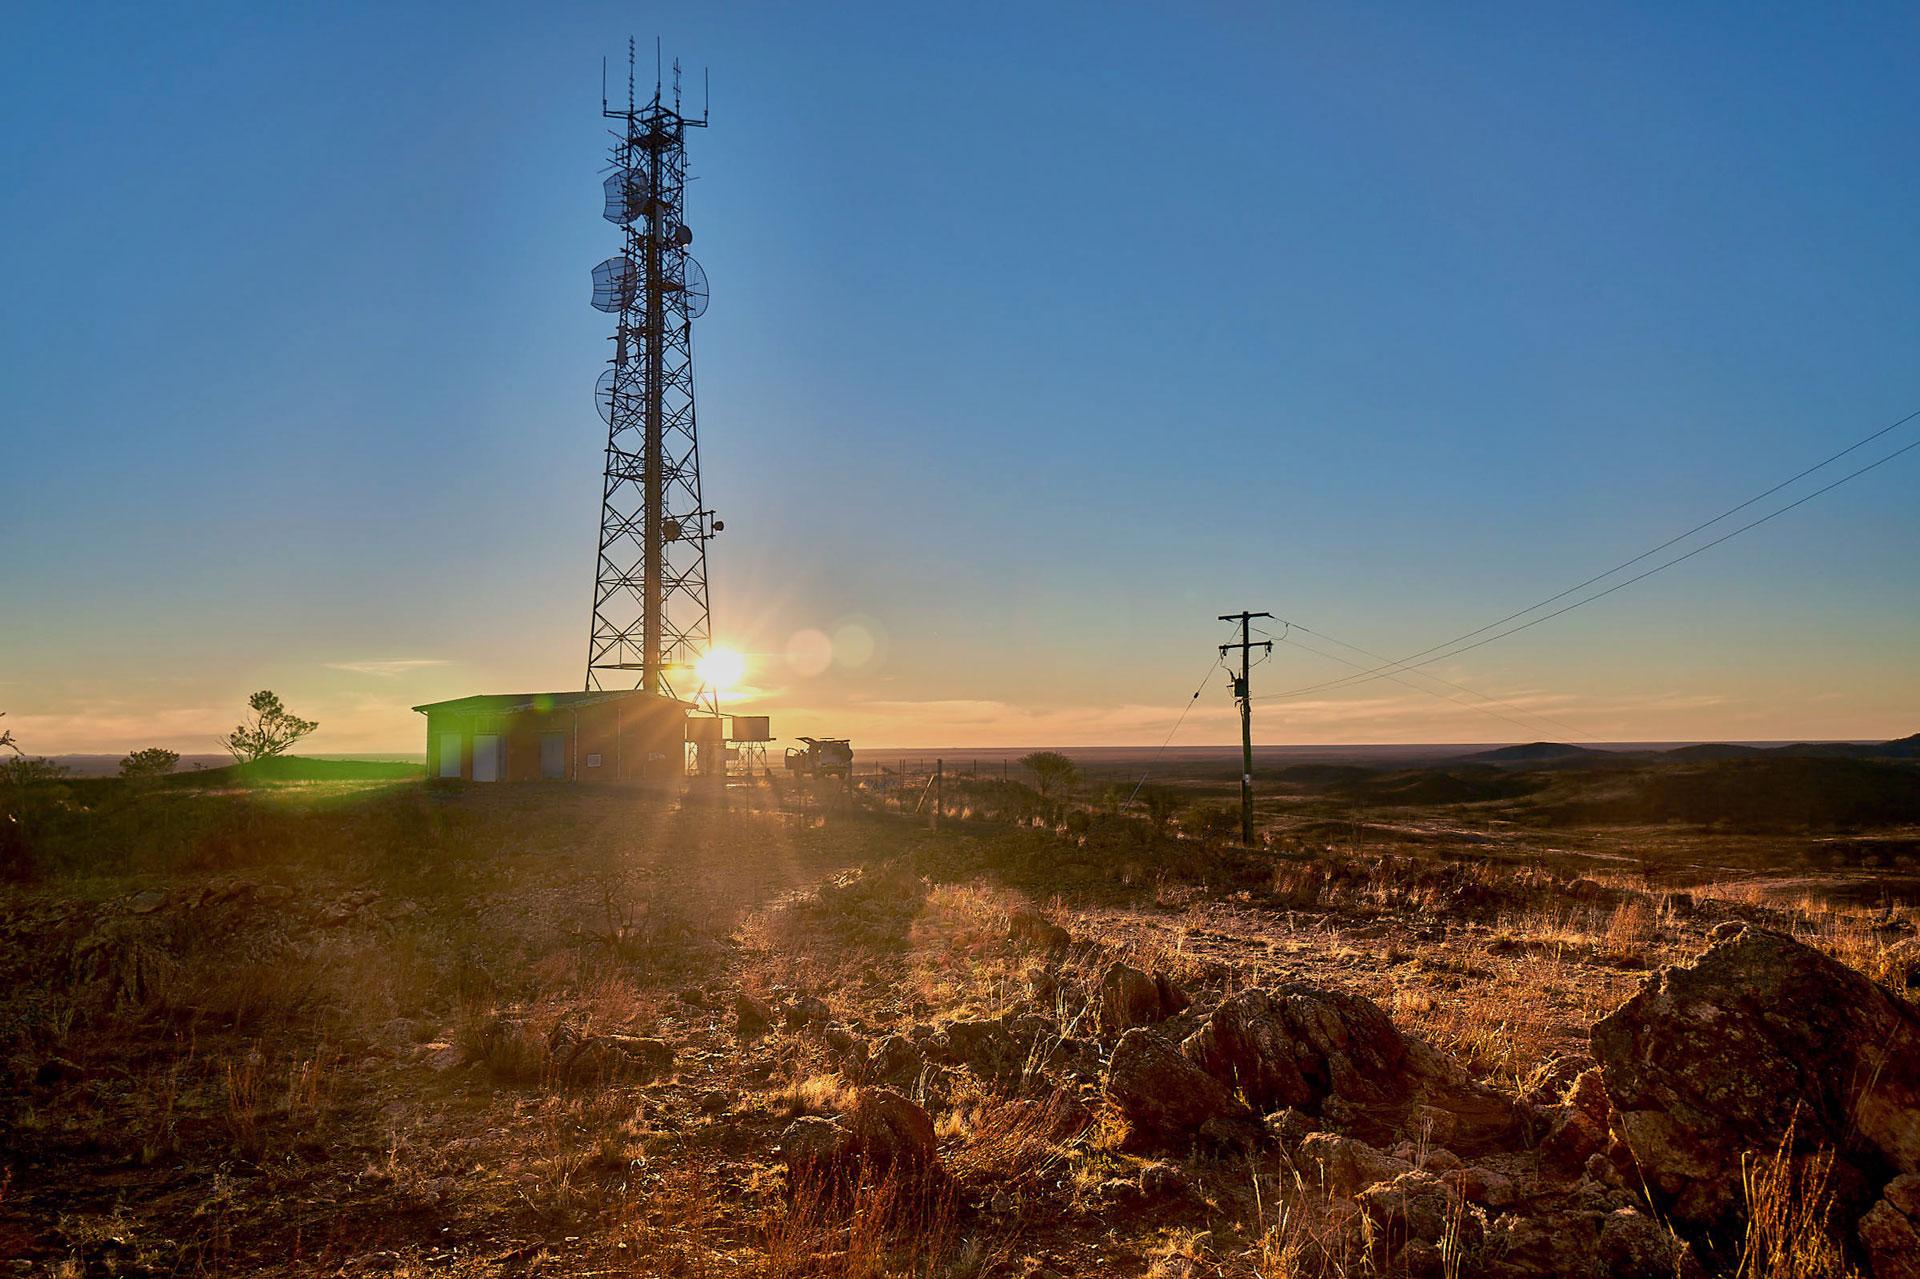 An Amplitel tower at sunset